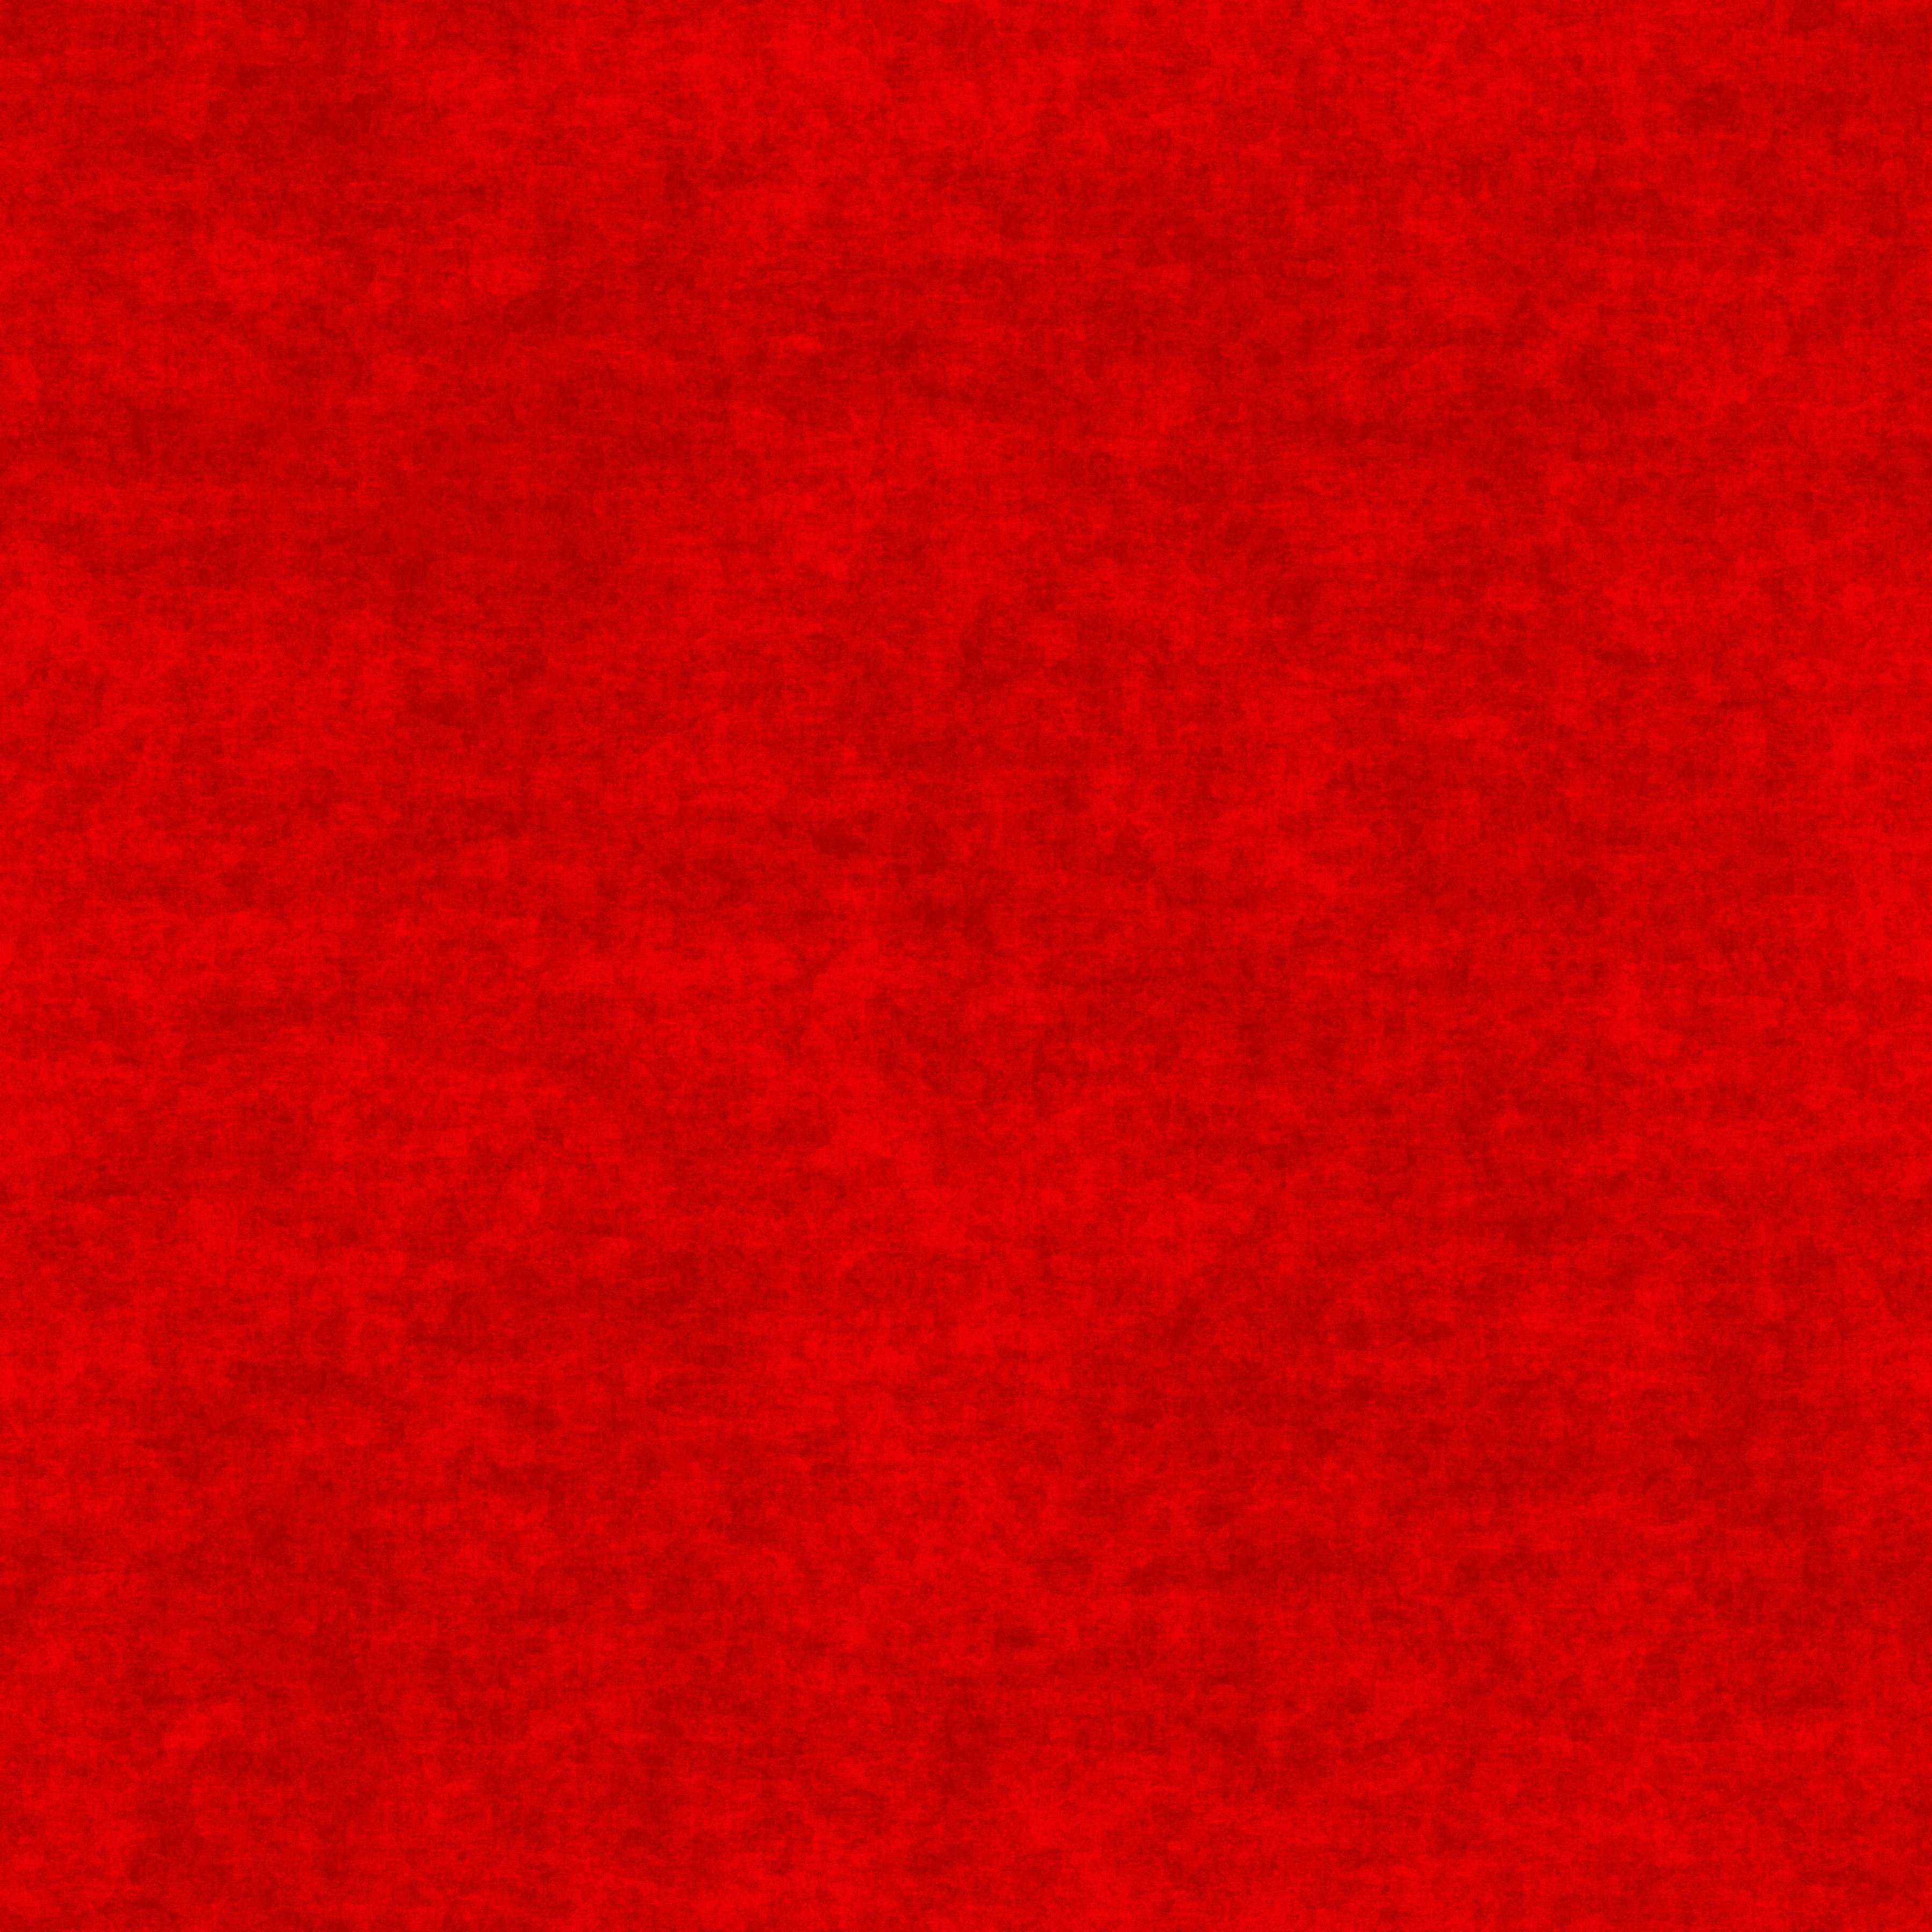 grunge, red, seamless